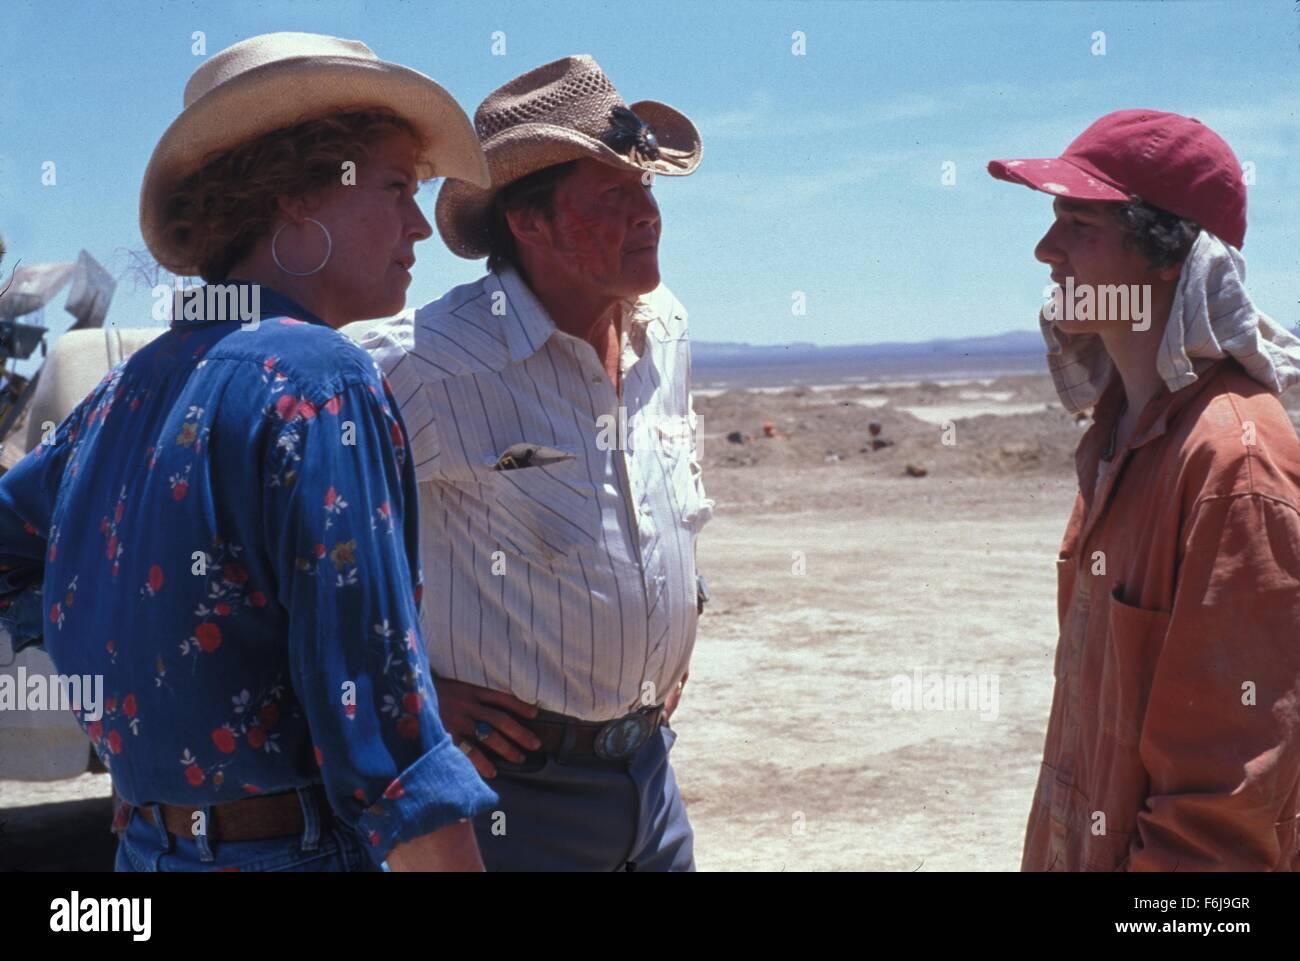 may 01 2003 hollywood ca usa shia labeouf as stanley yelnats iv